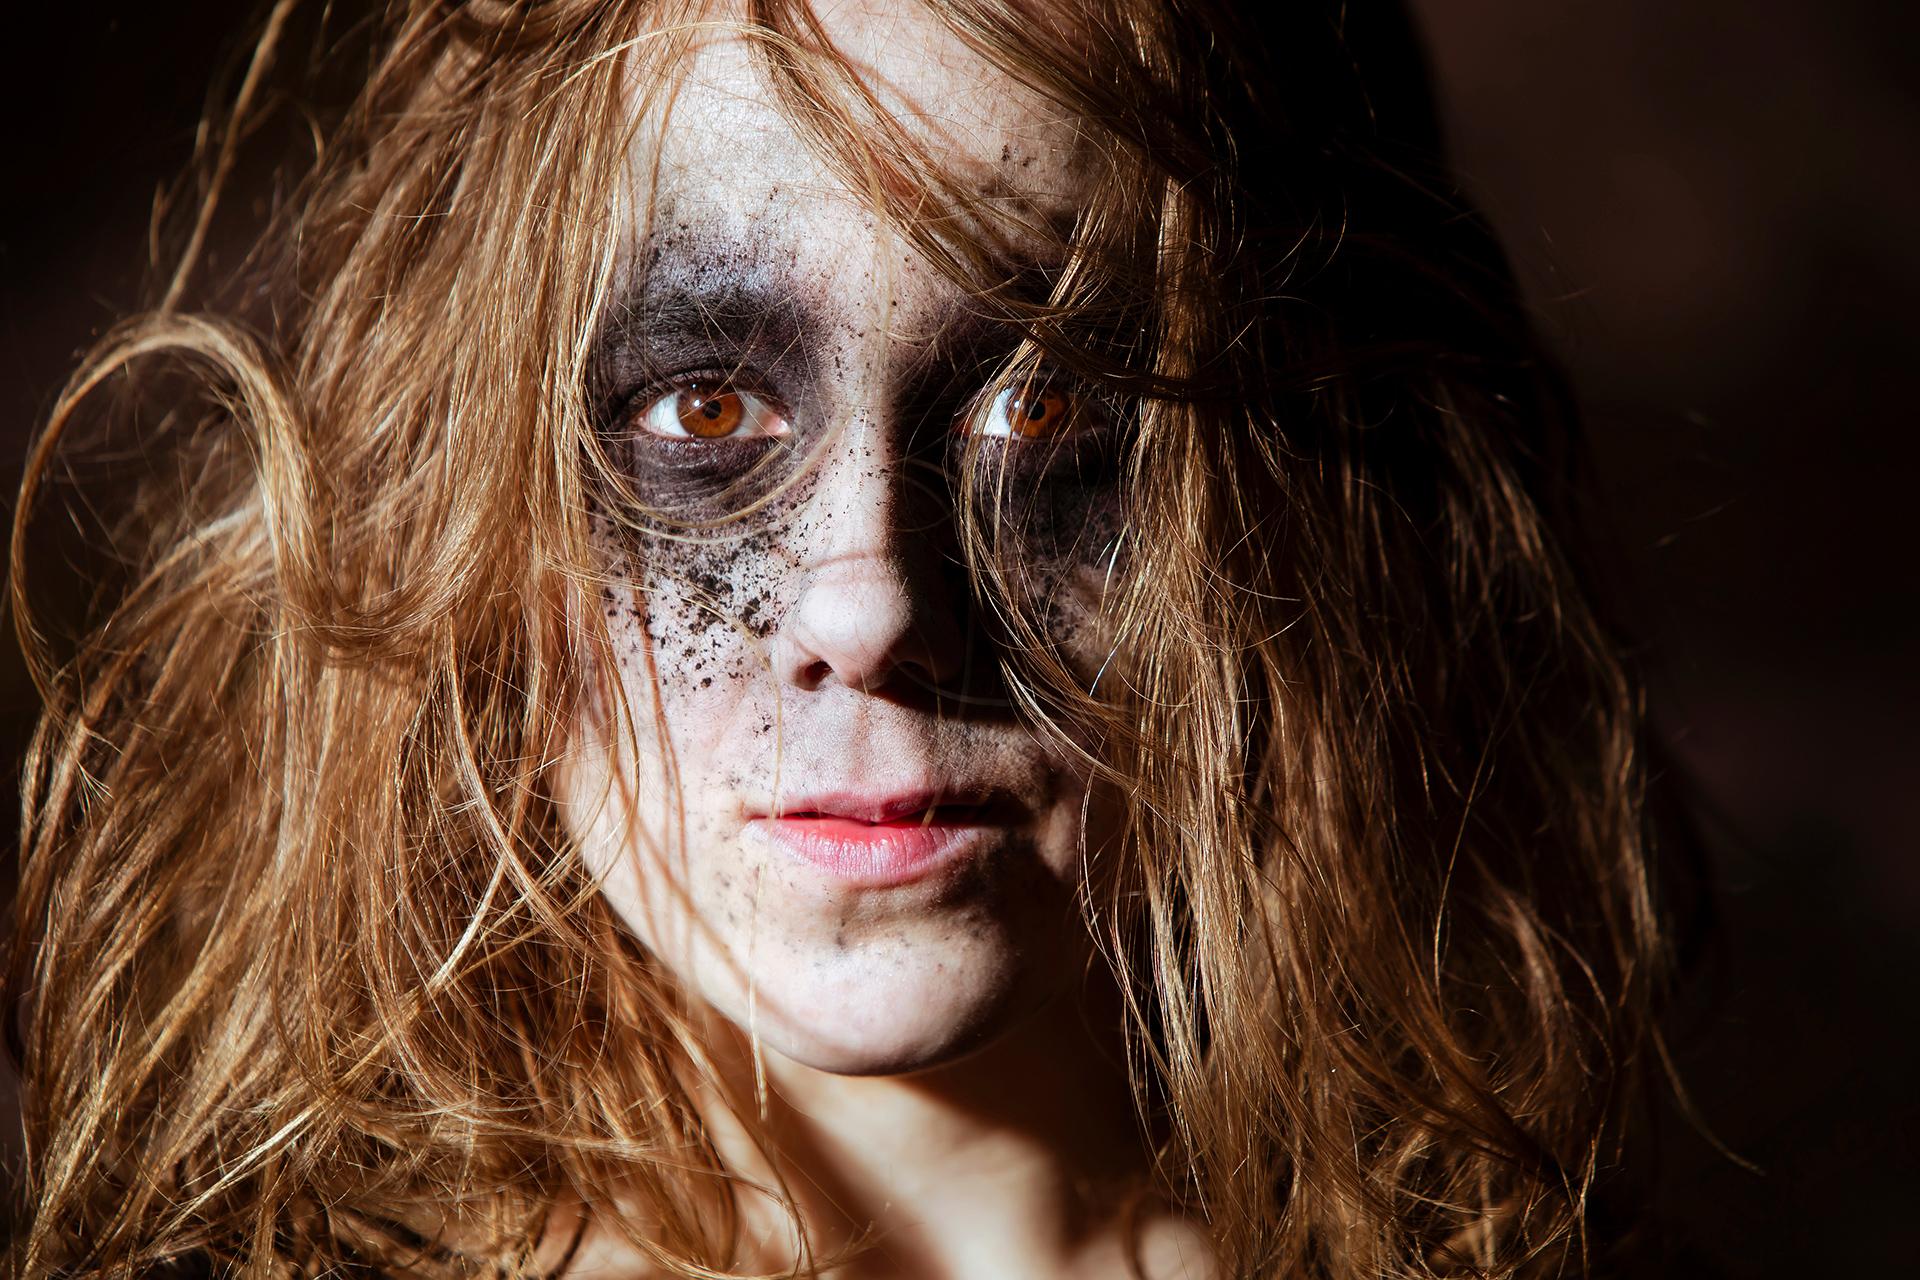 Stella Laine, Lauttasaari, Suomi, Finland, island, Helsinki, art, model, swan, daemon, dark, aesthetics, Baltic sea